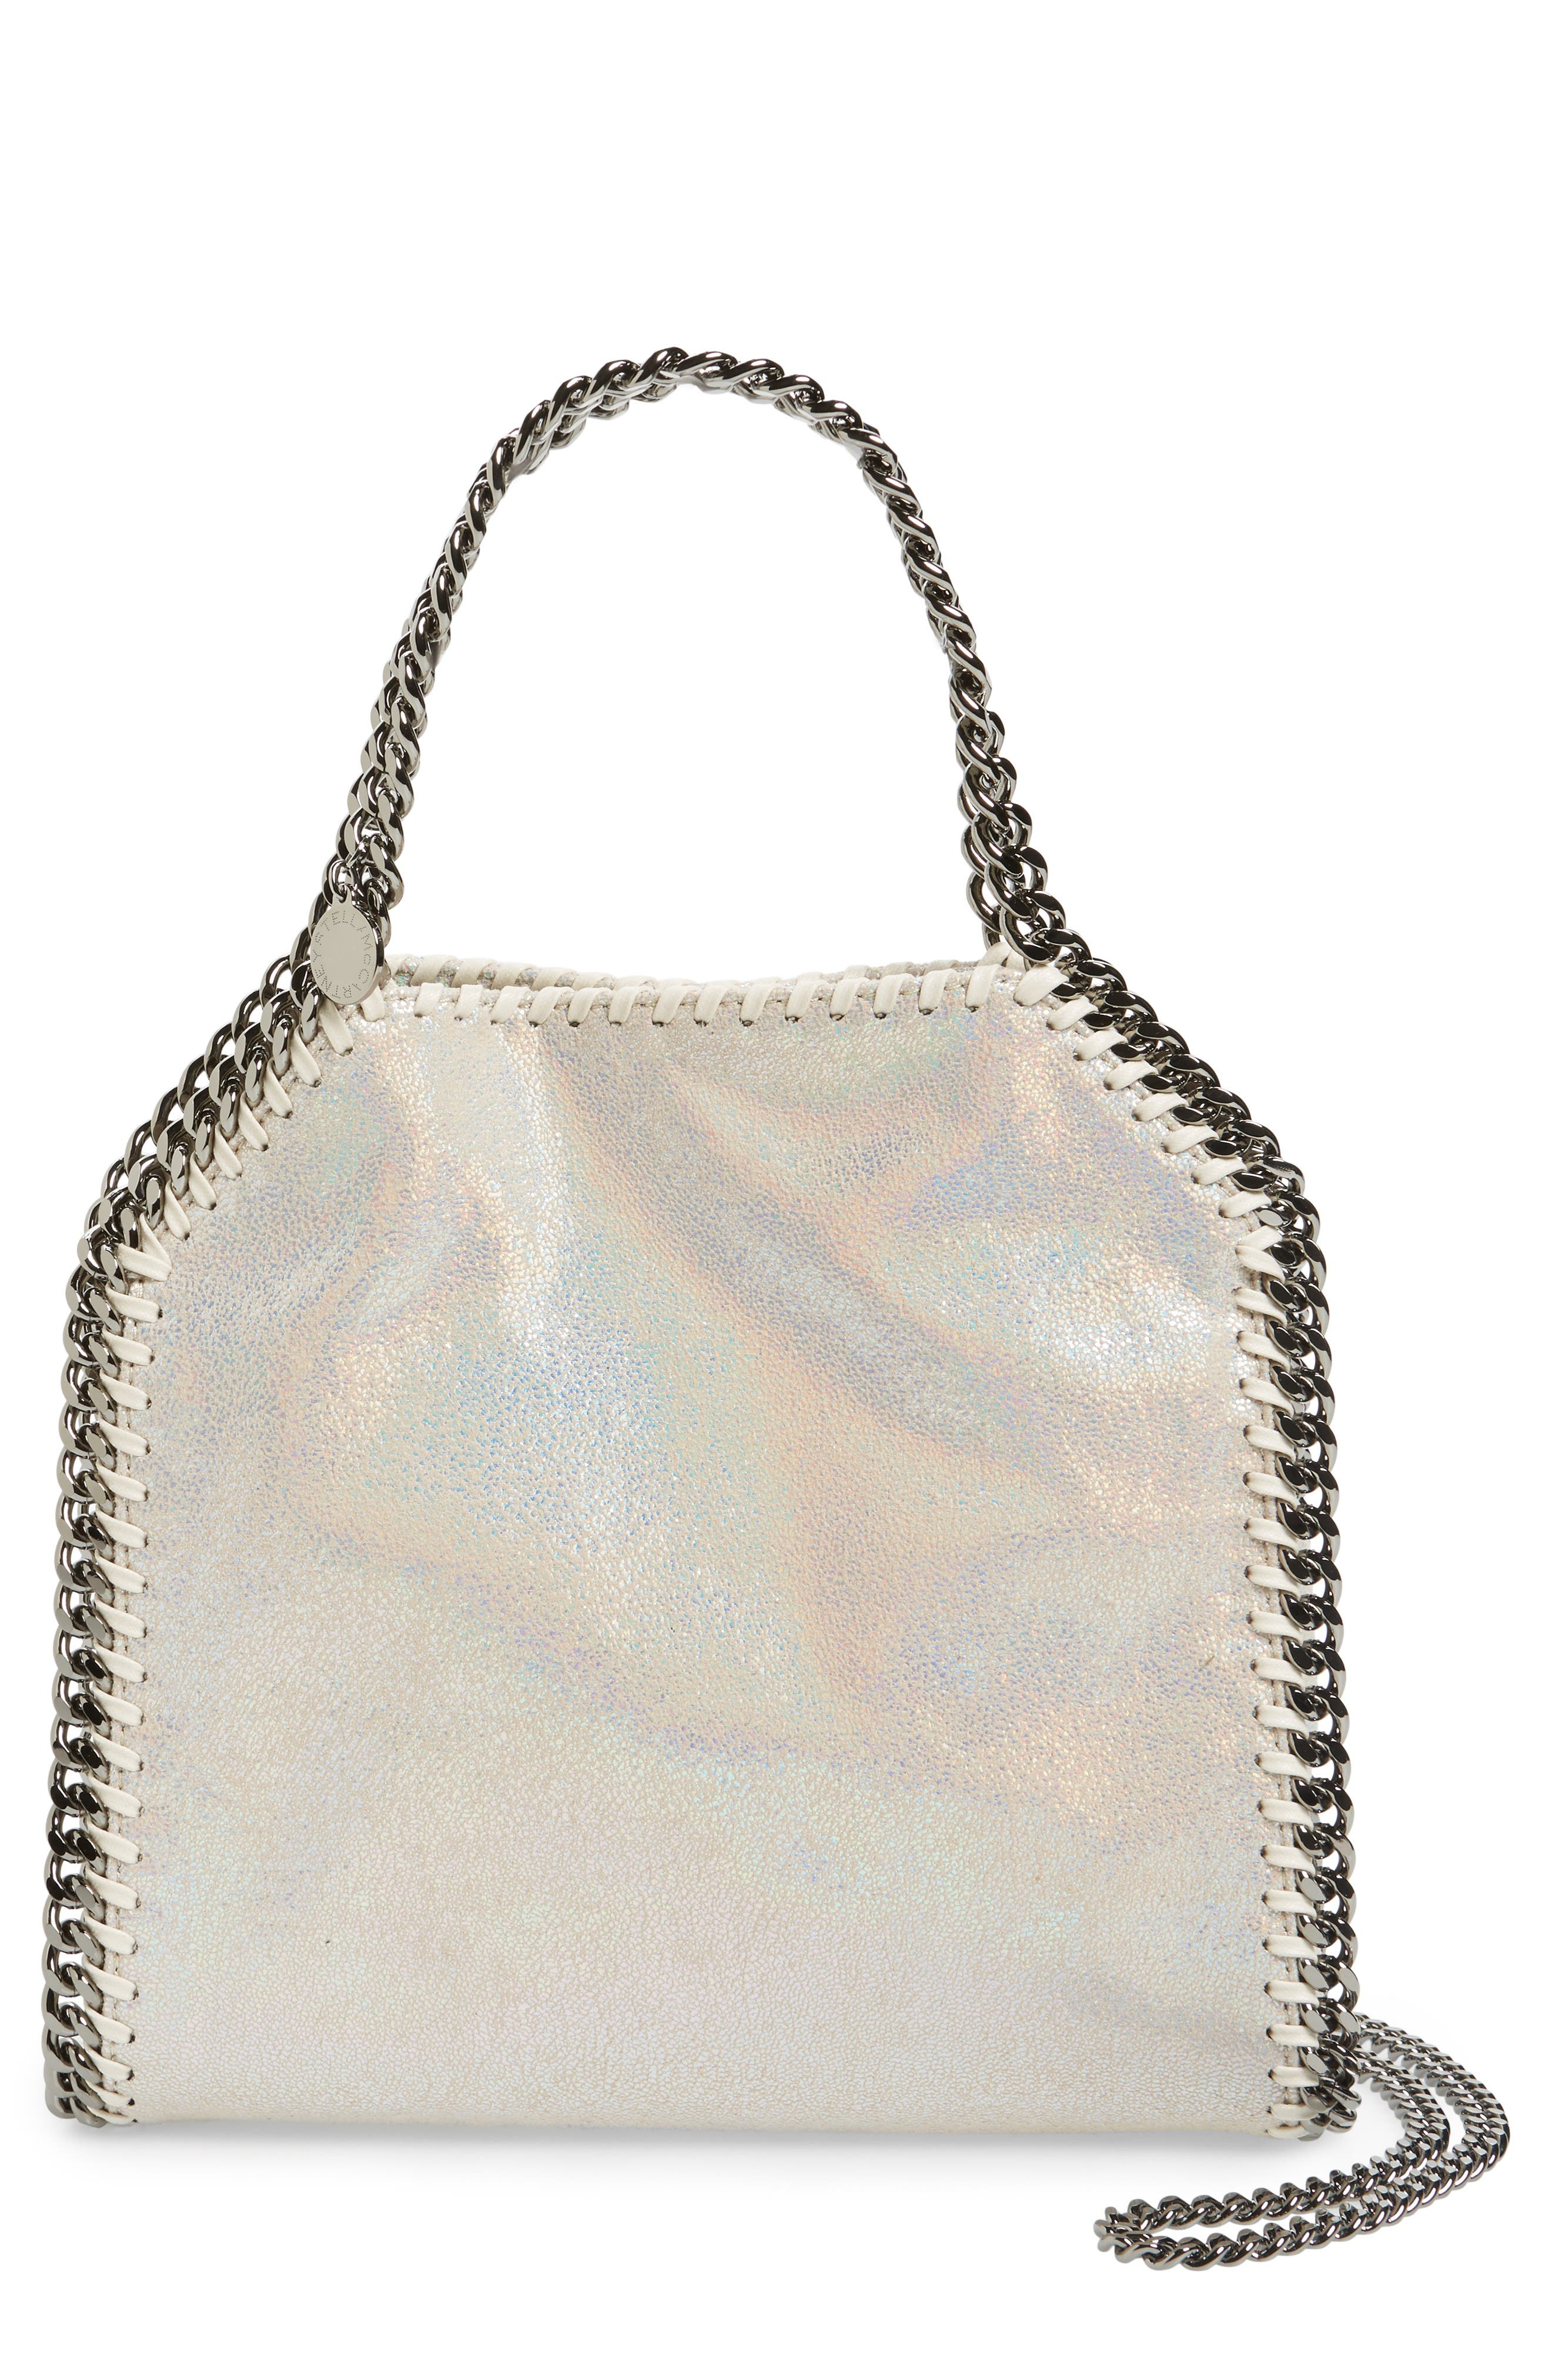 Alternate Image 1 Selected - Stella McCartney Mini Falabella - Holograph Faux Leather Crossbody Bag